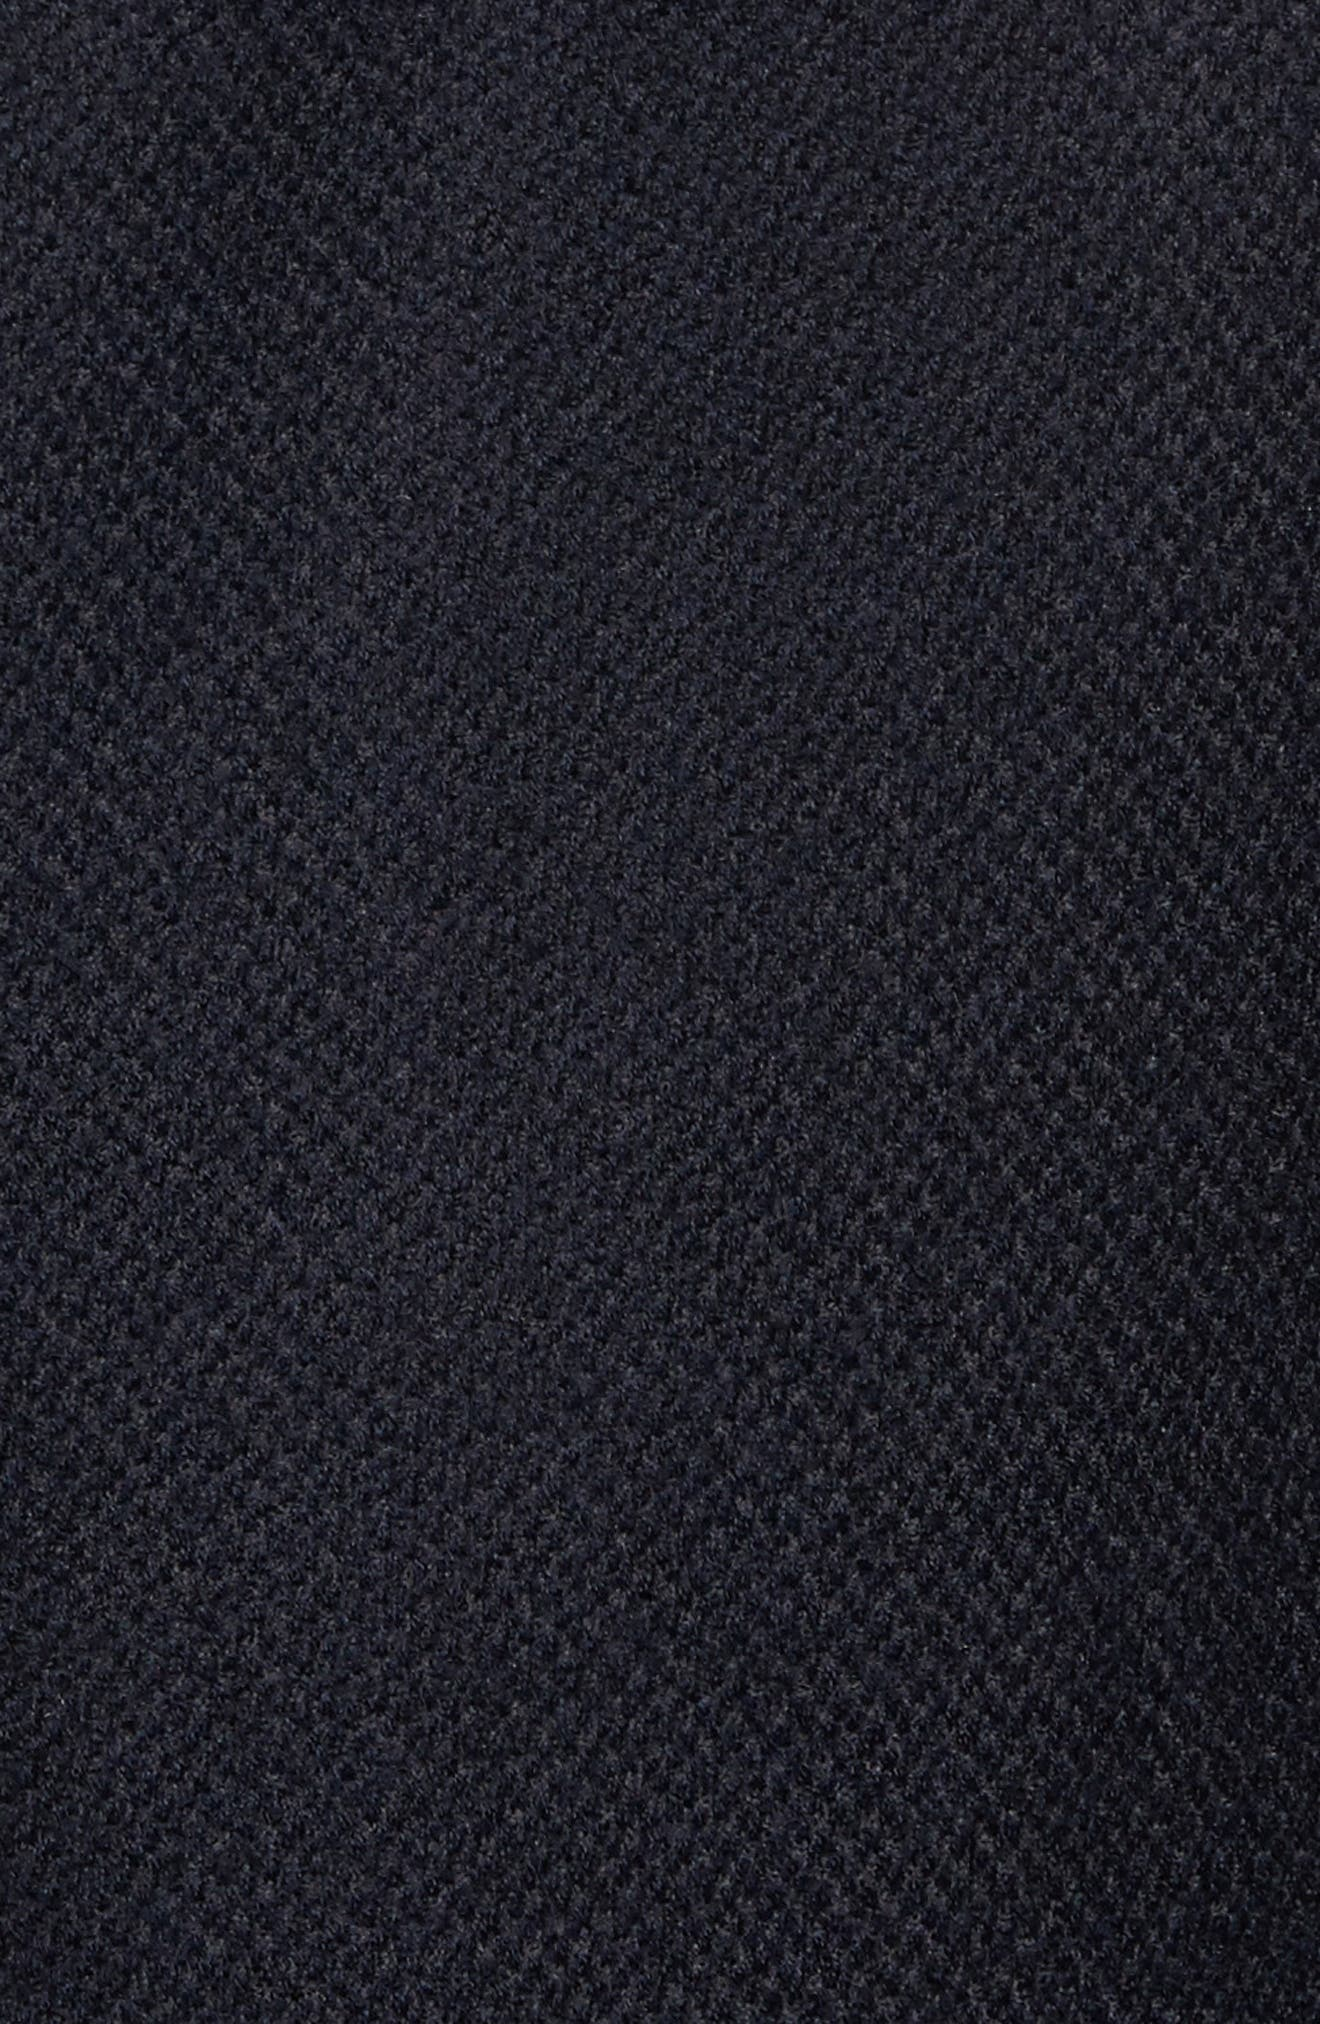 Ritchie Aim Hybrid Classic Fit Wool & Cashmere Sport Coat,                             Alternate thumbnail 6, color,                             410